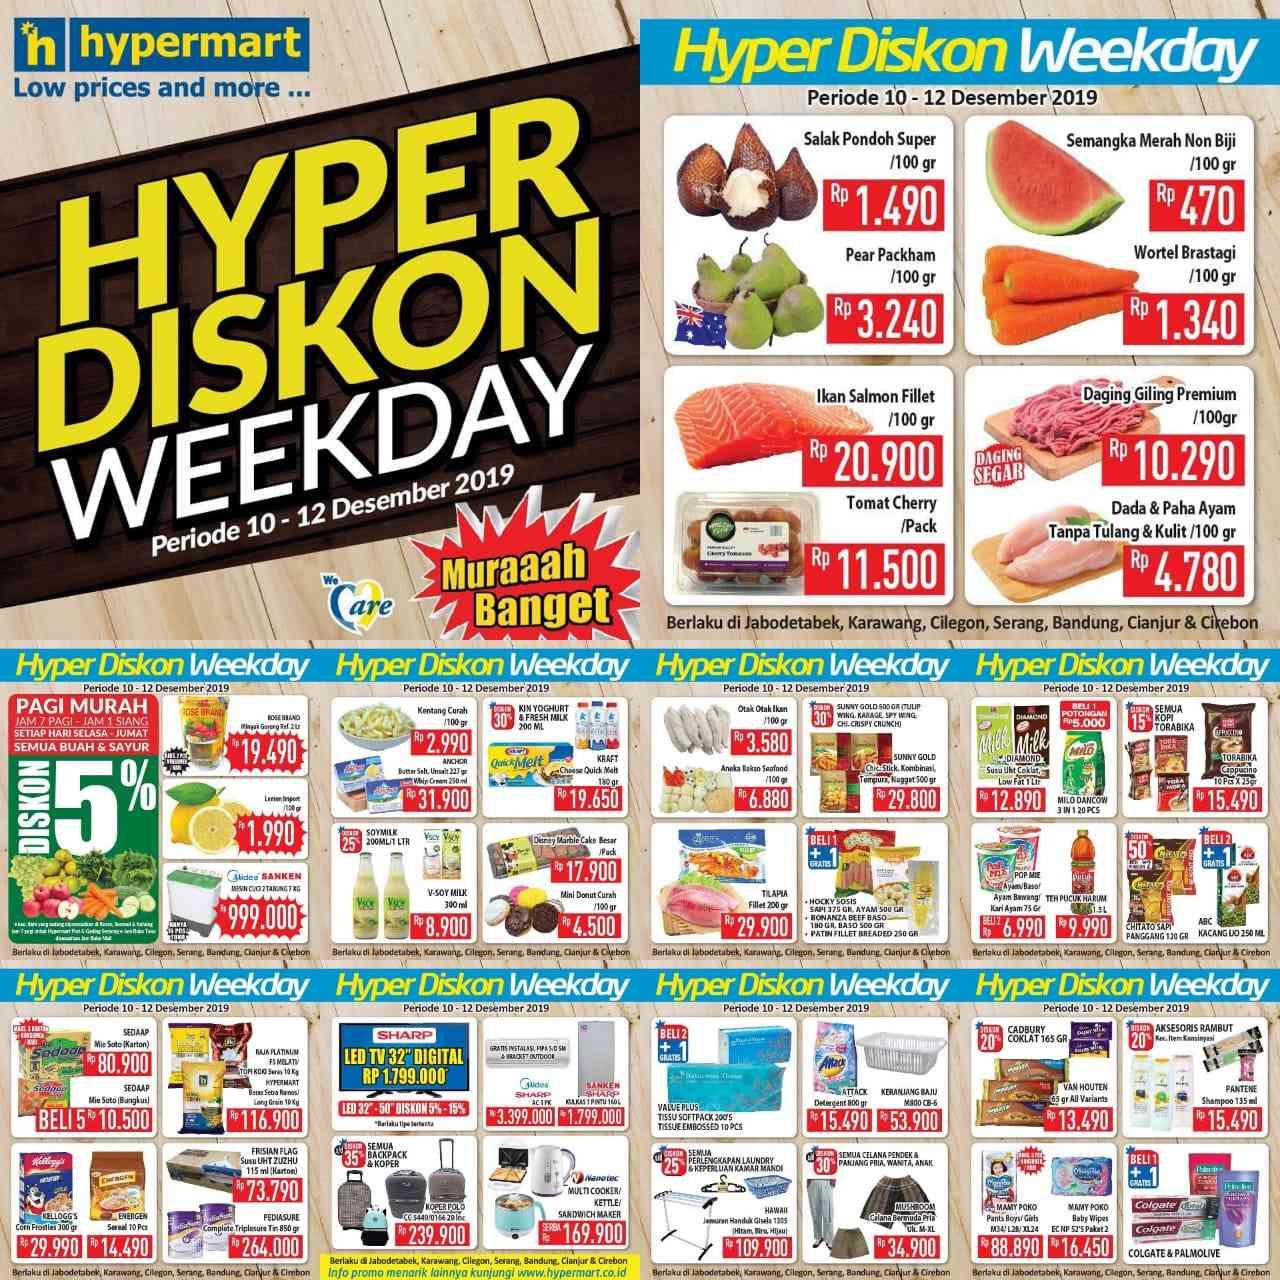 Diskon Katalog Promo Hyper Diskon Hypermart Periode 10-12 Desember 2019